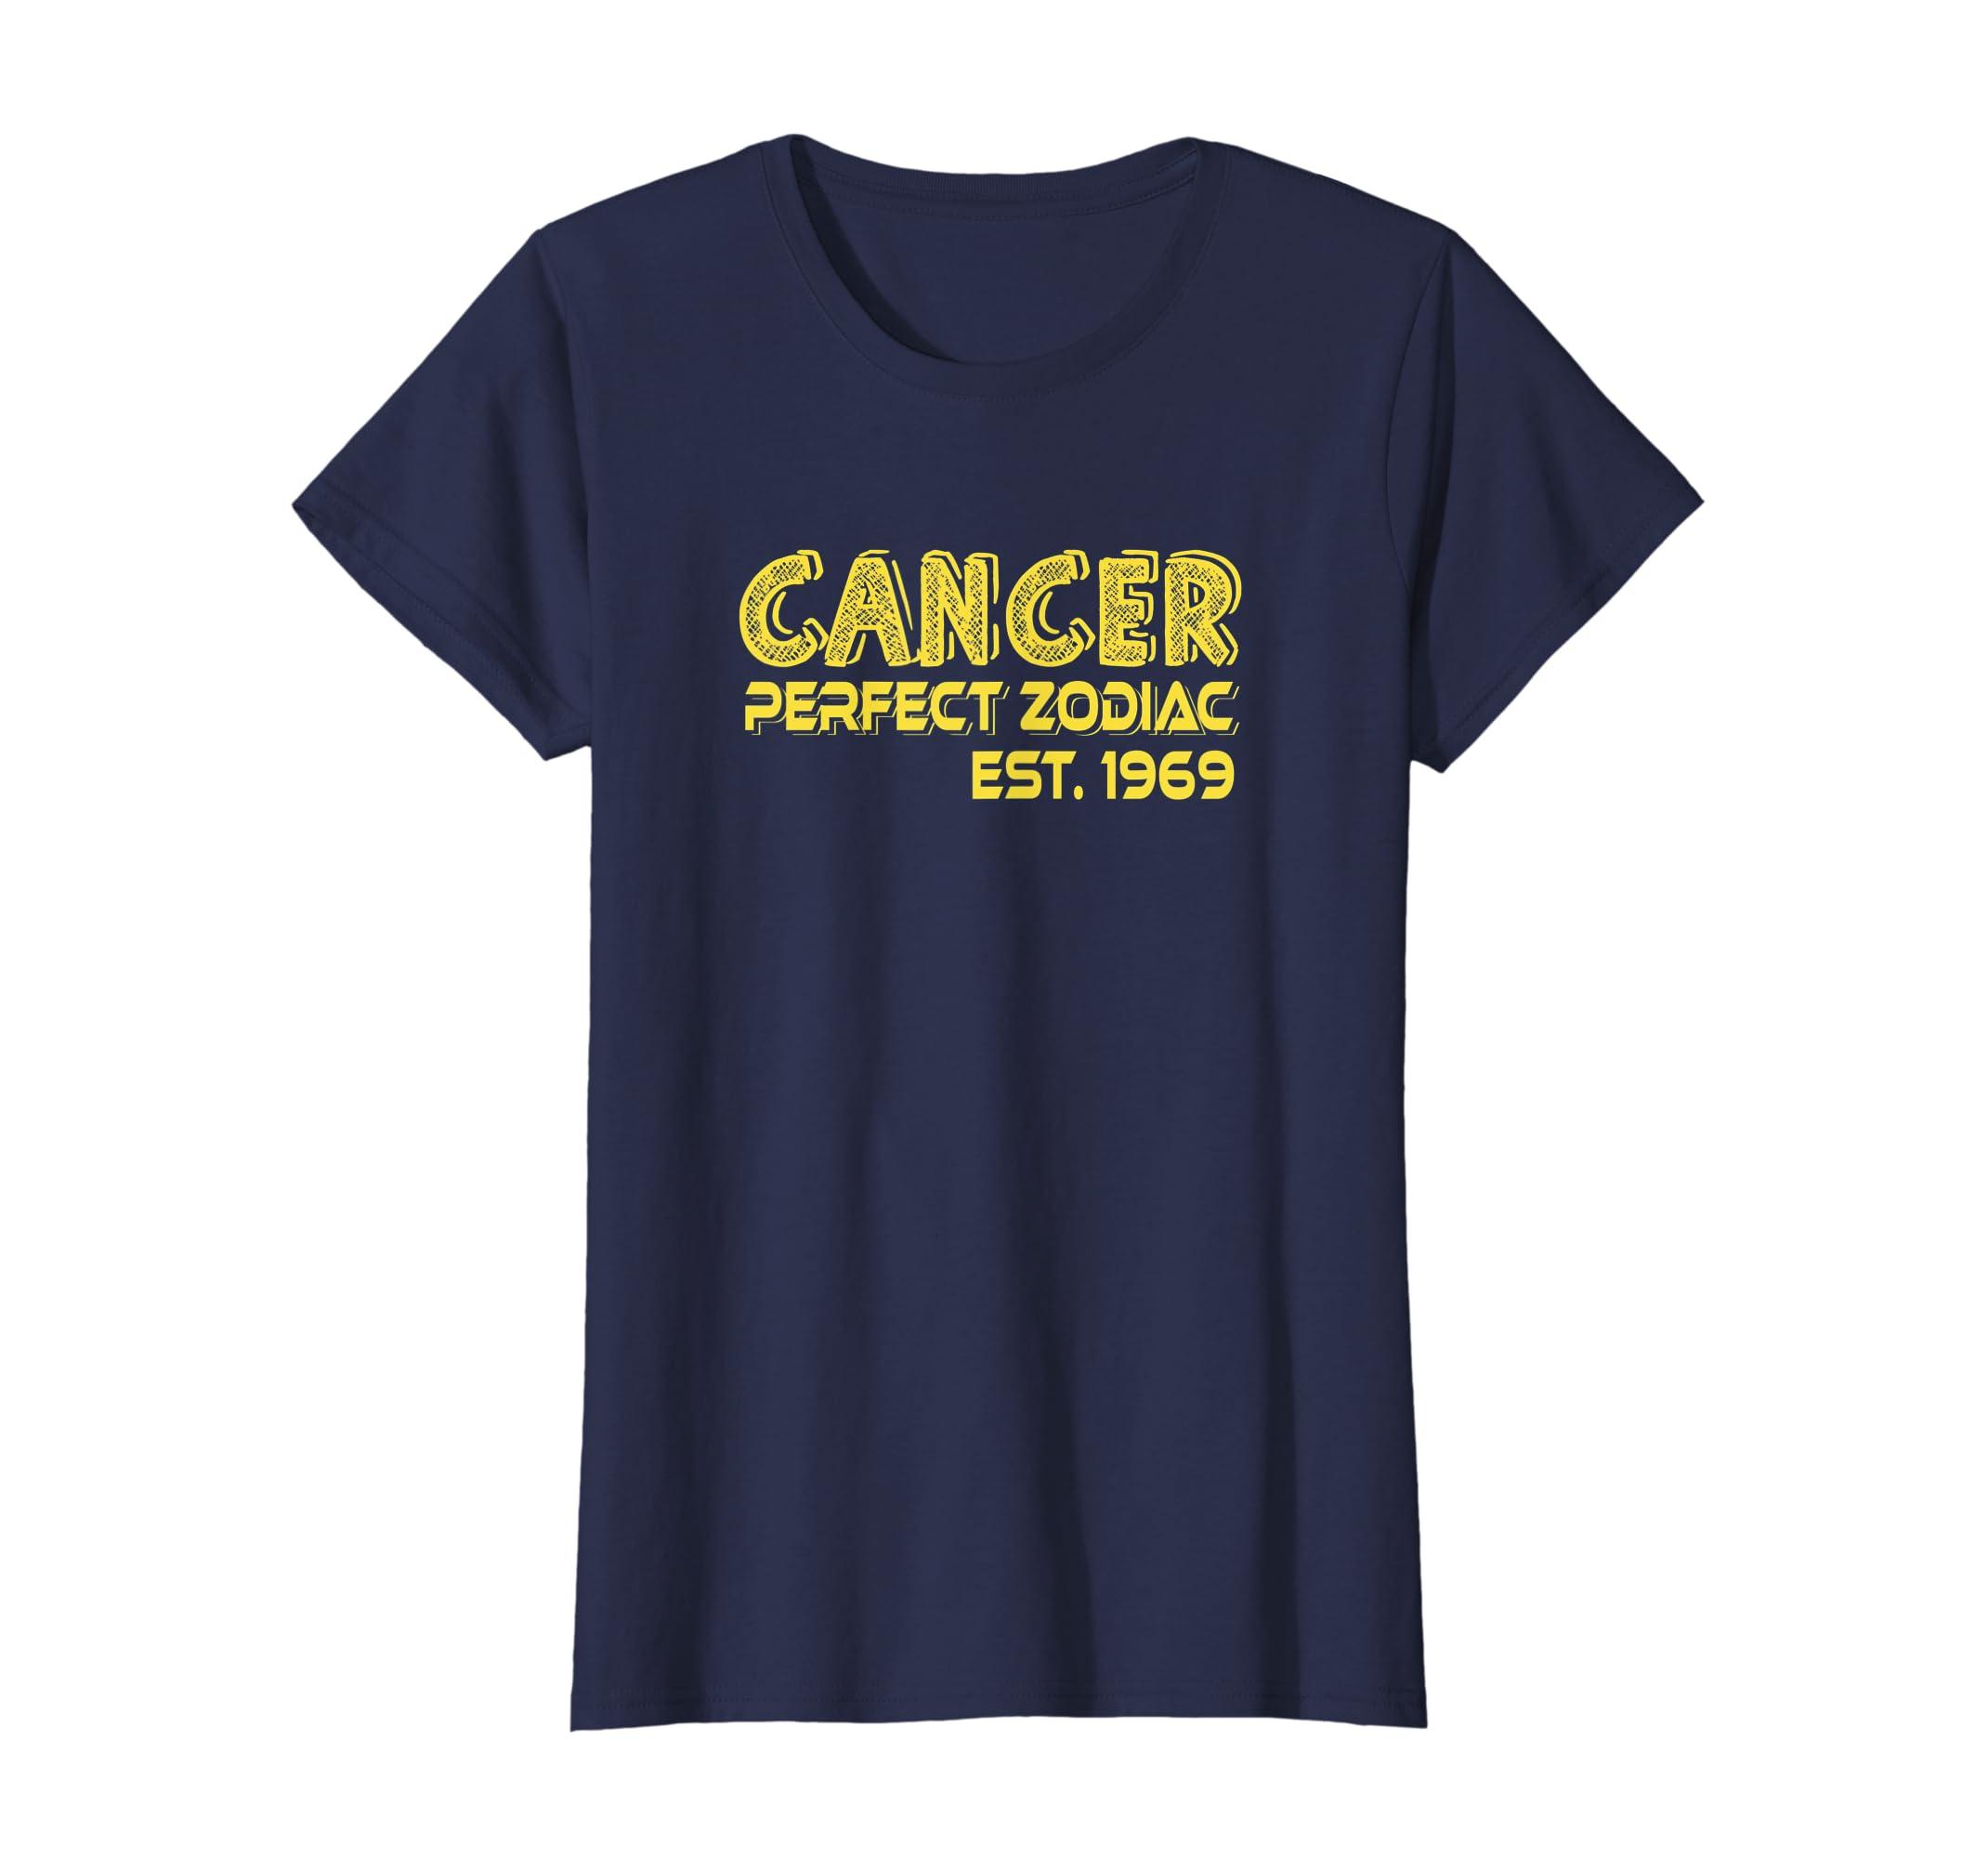 8bcd22a8 Amazon.com: Funny Cancer 1969 Perfect Zodiac 50th Birthday Gift T-shirt:  Clothing